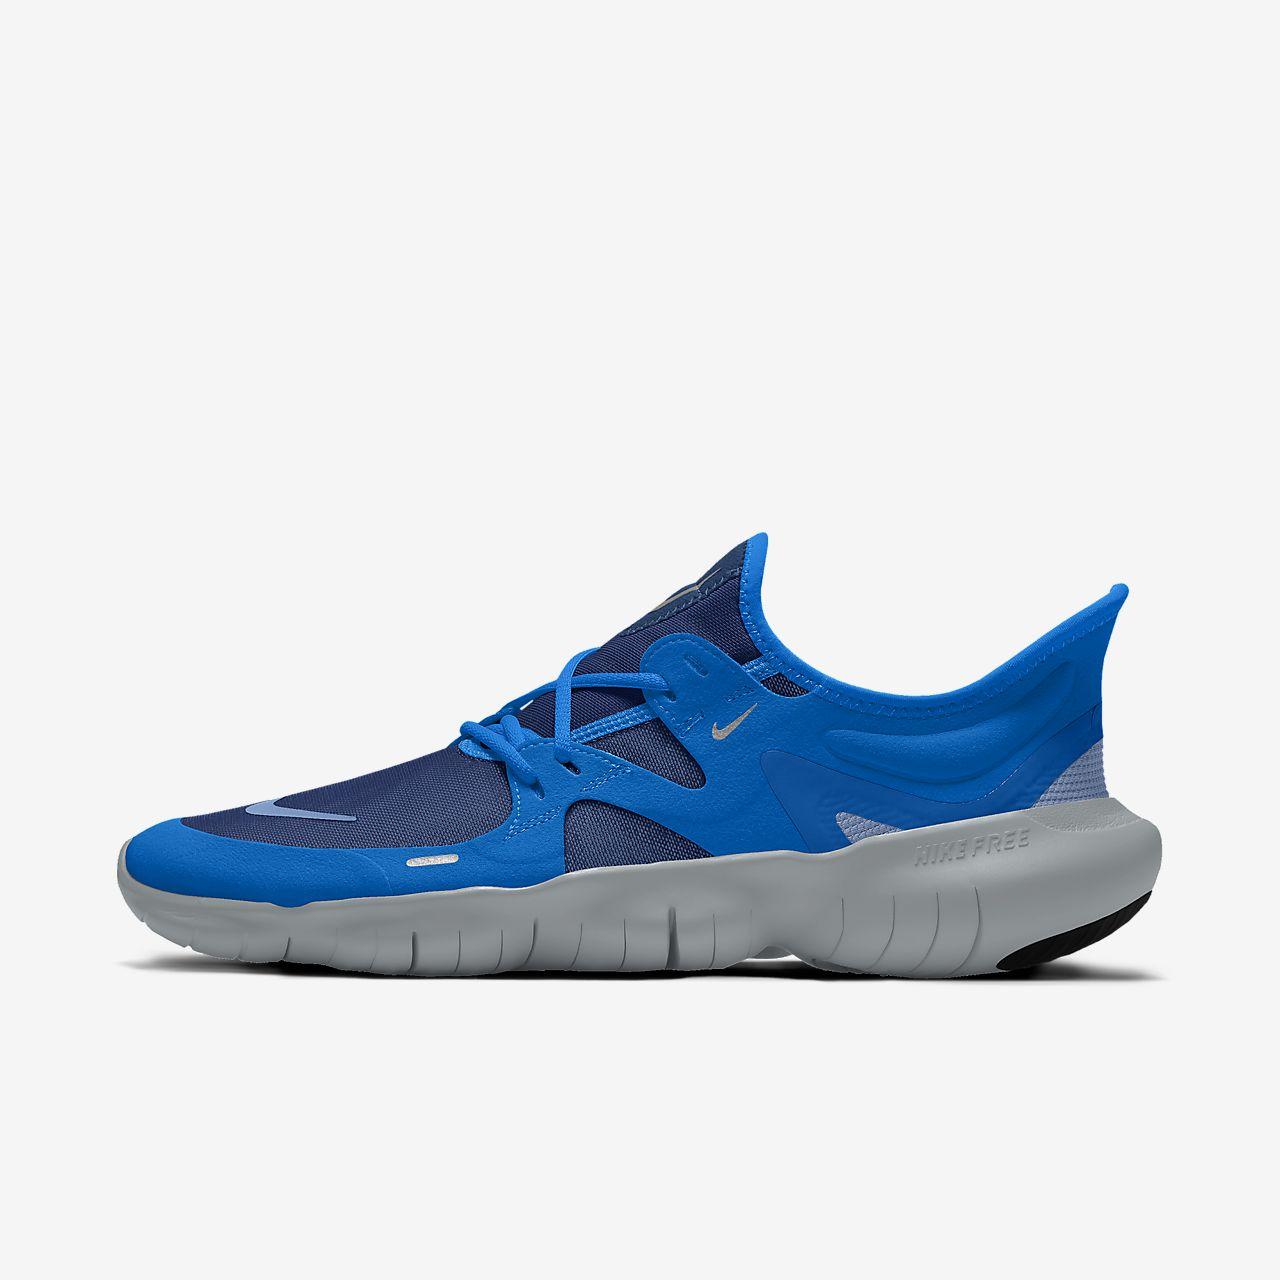 Nike Free RN 5.0 By You Zapatillas de running personalizables - Hombre